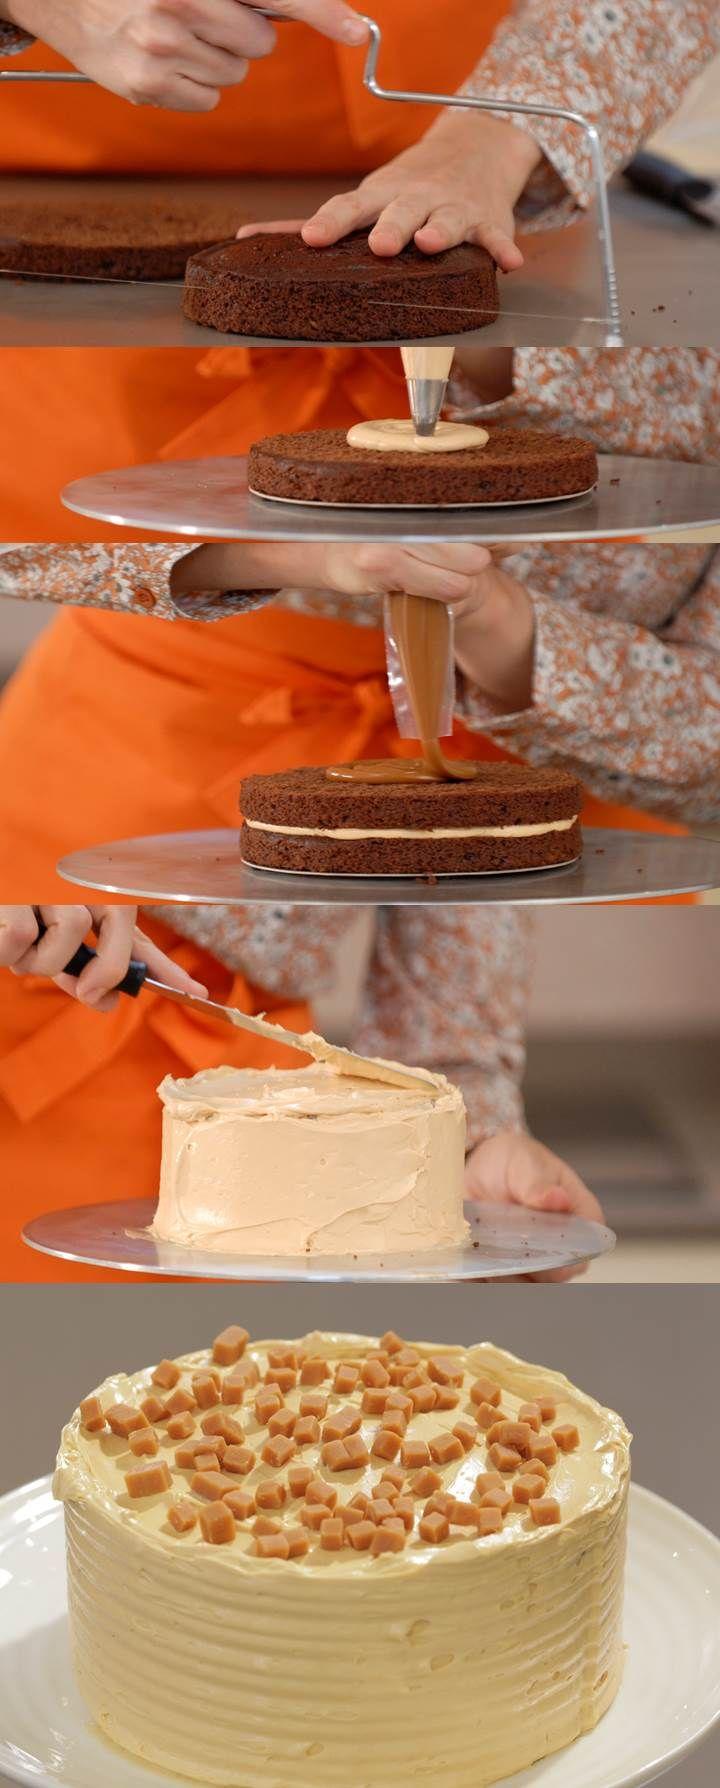 Cupcake Maniacs 11: Tarta chocolate y dulce de leche